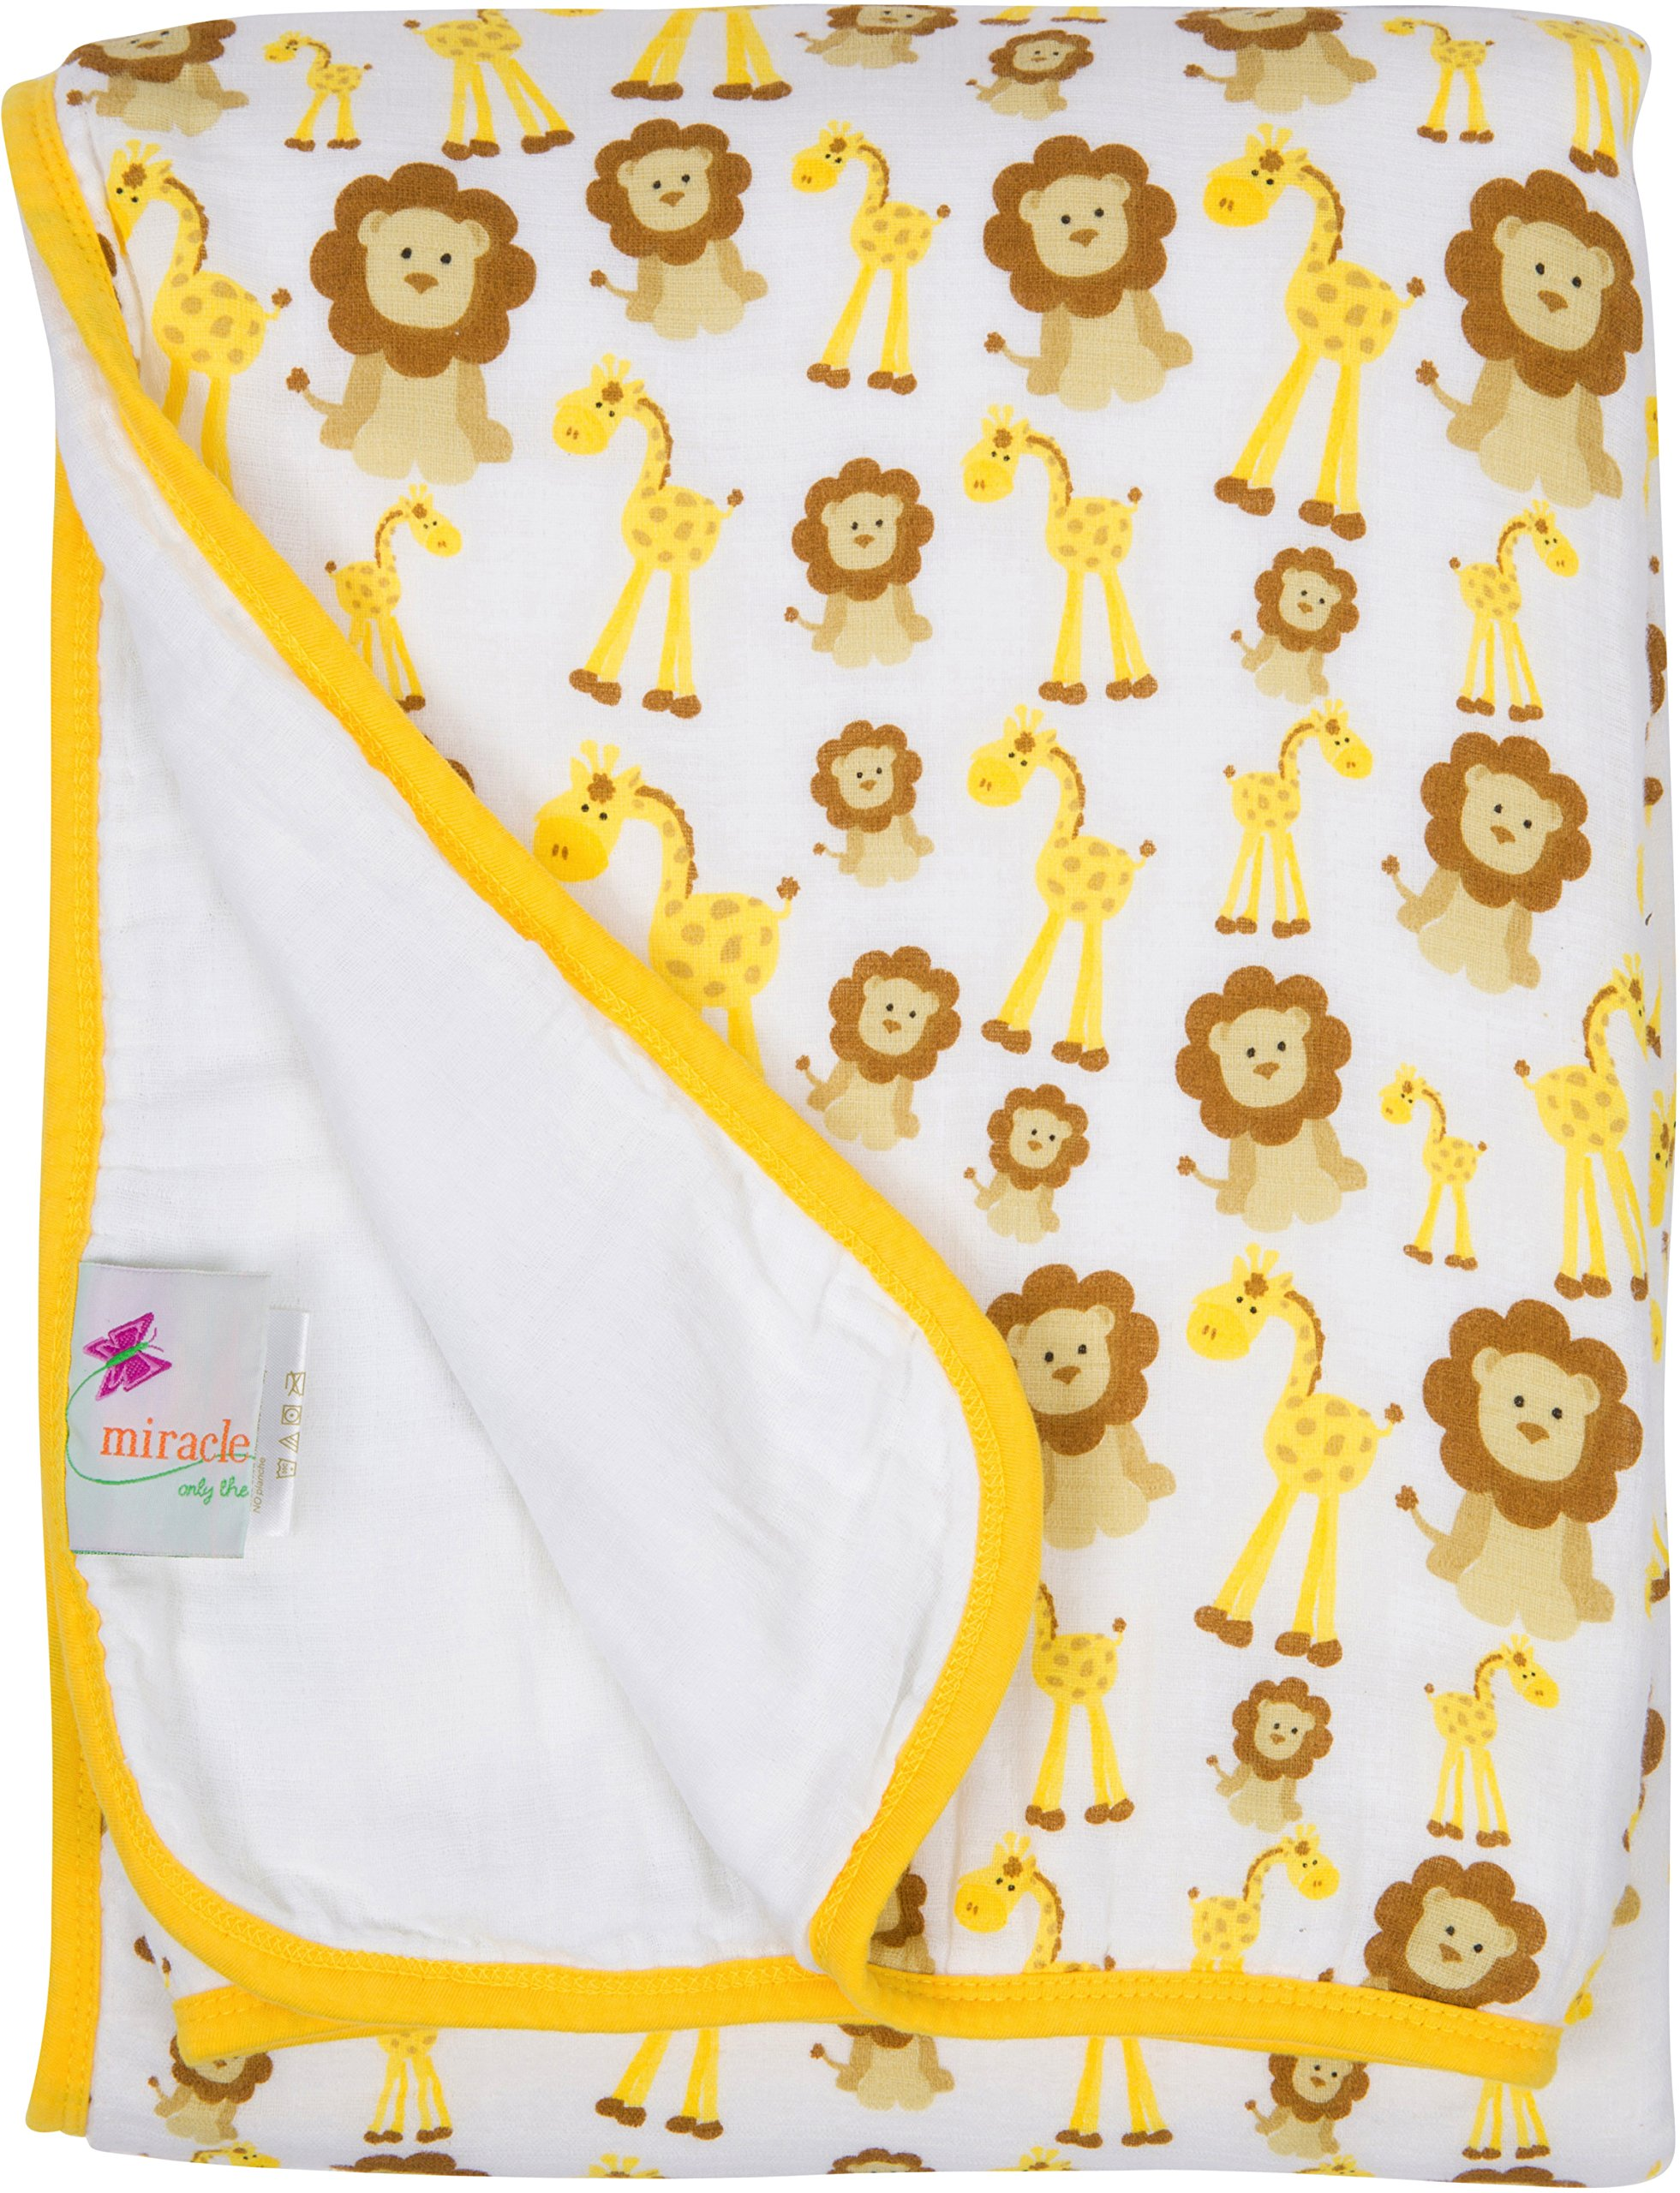 MiracleWare Extra Large Kids Muslin Playtime Toddler Blanket - Giraffes & Lions